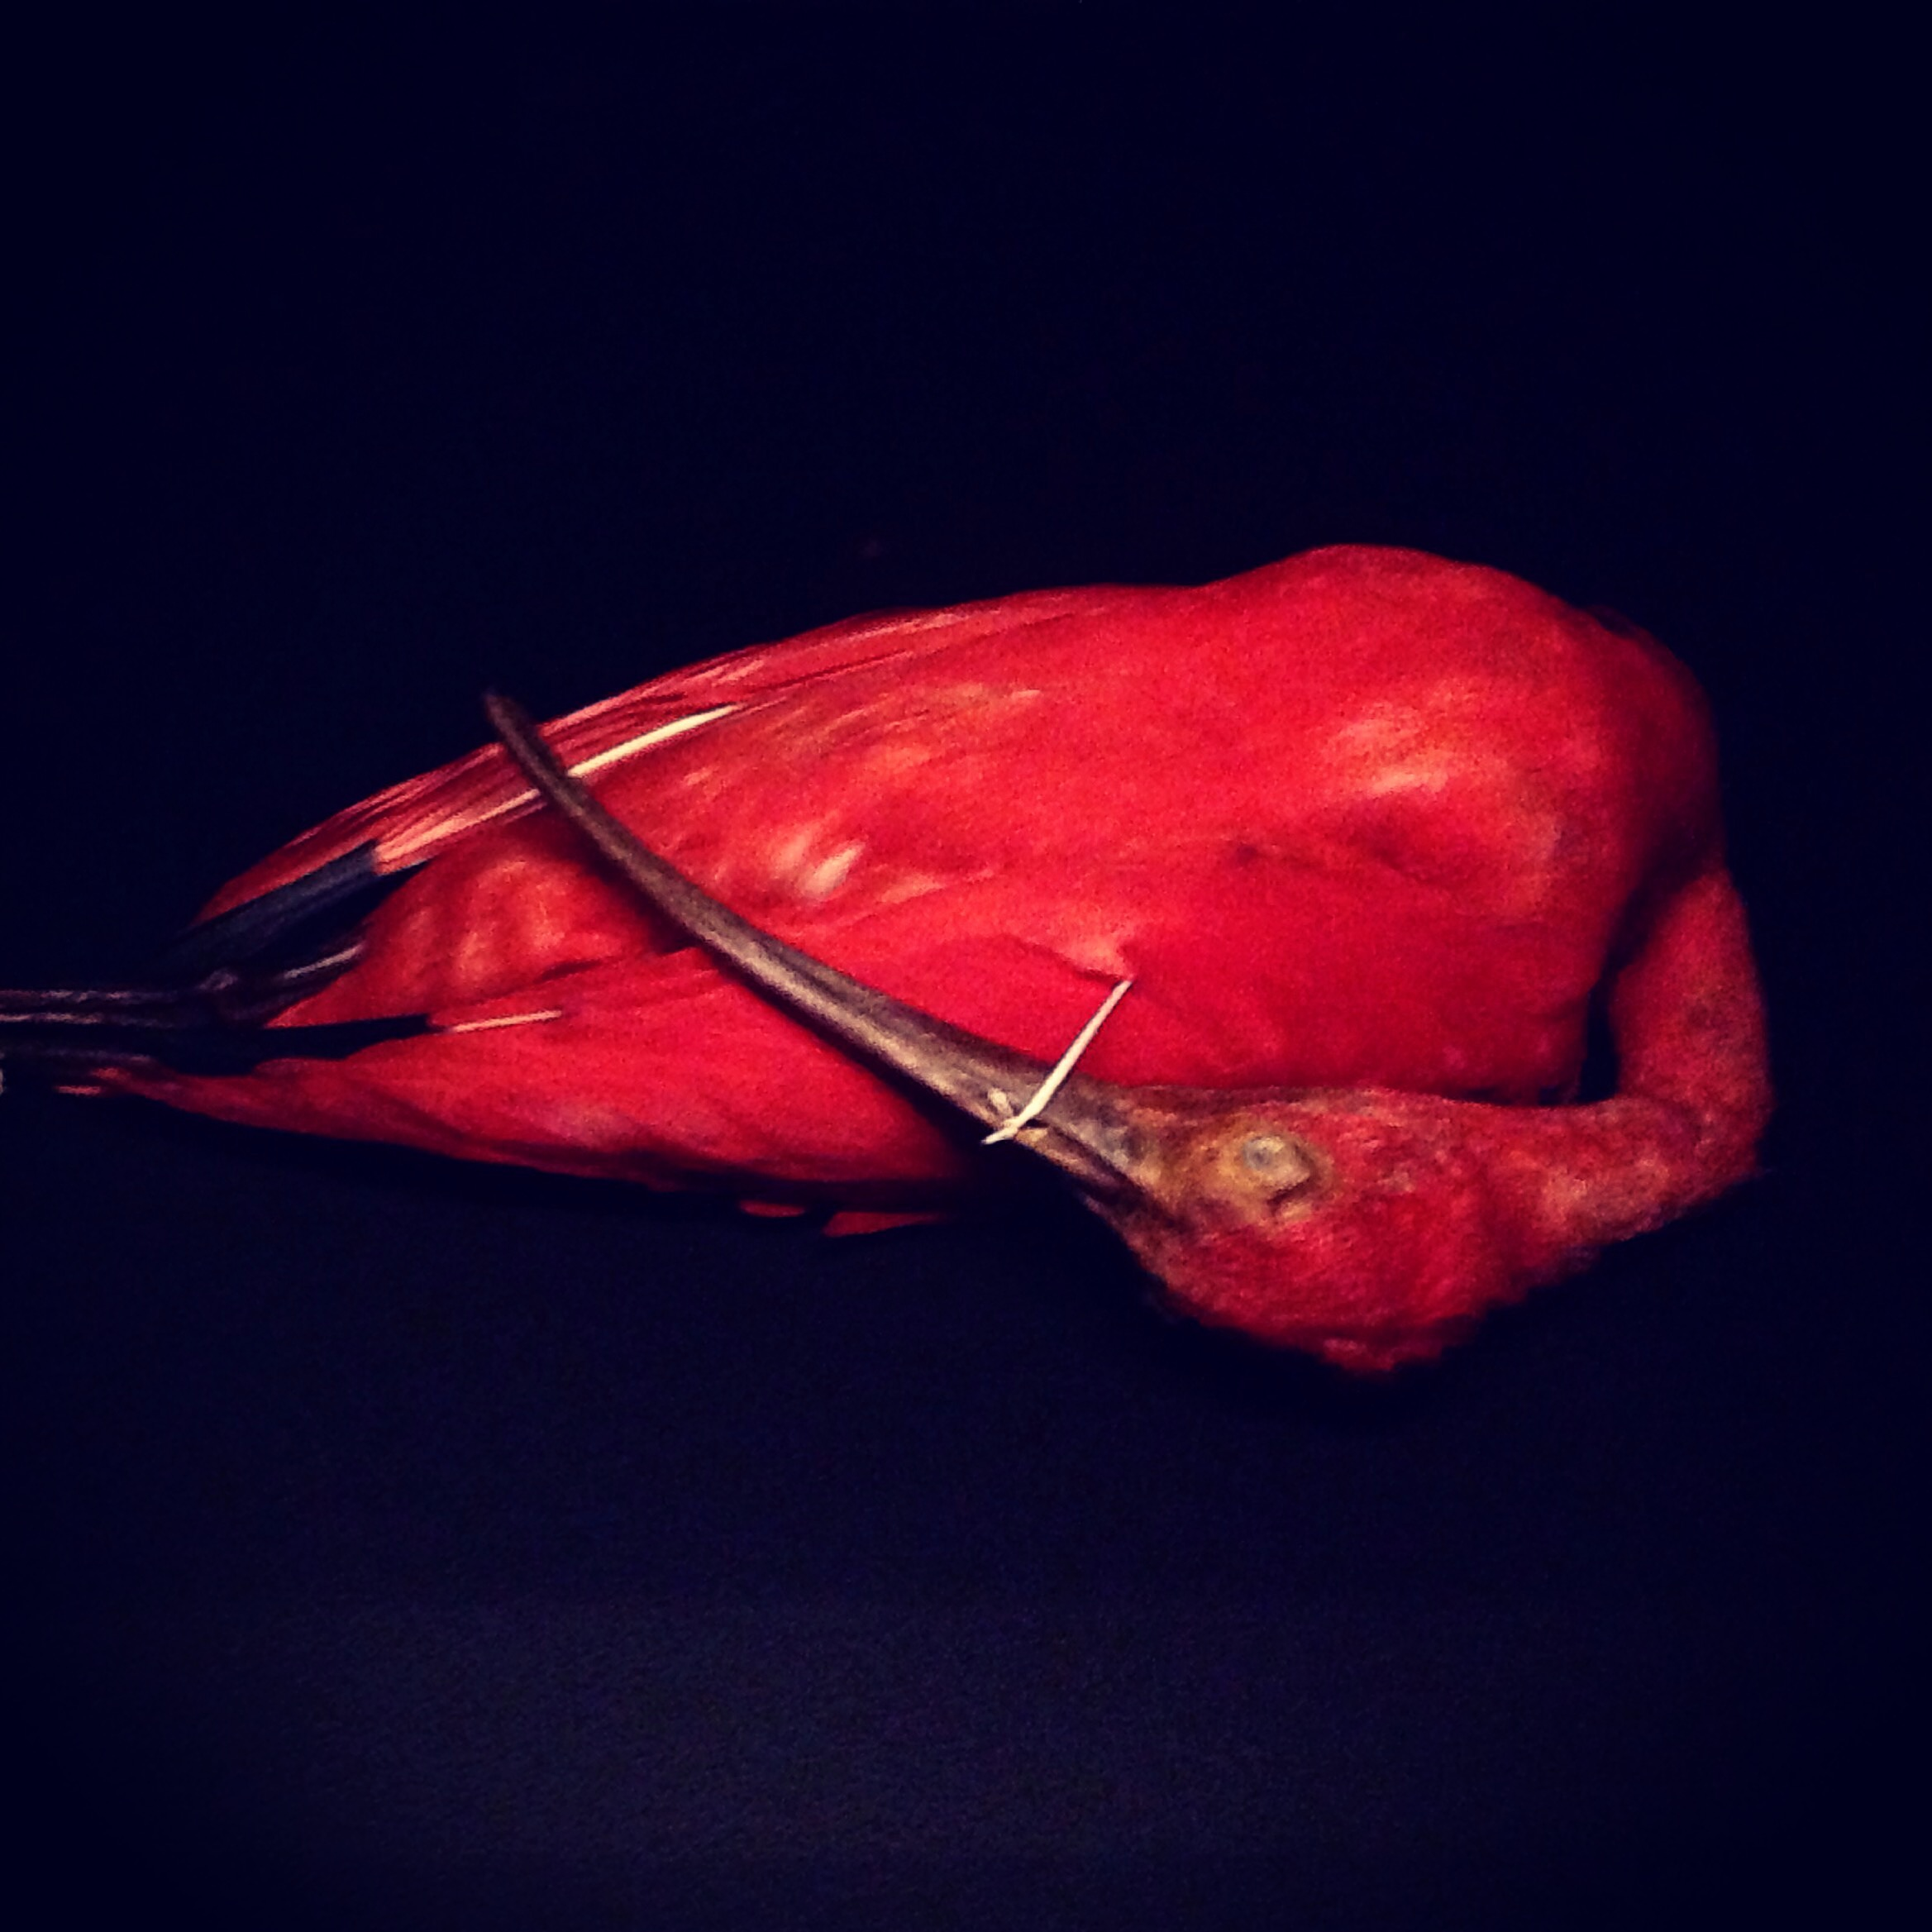 flamingo. Photo by Lindsay McDonagh